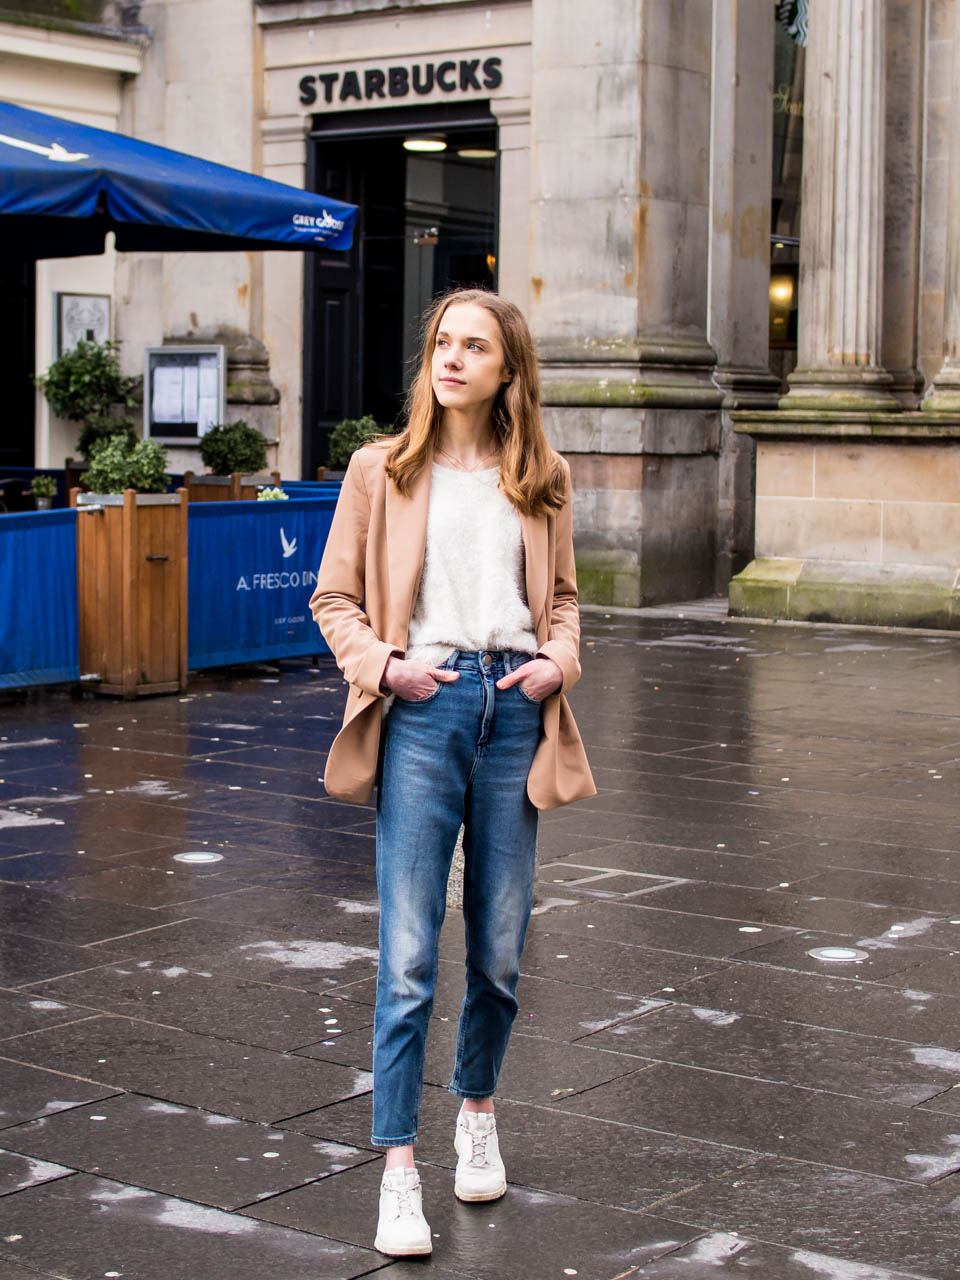 Spring outfit inspiration 2020, fashion blogger UK - Kevätmuoti 2020, inspiraatio, muotibloggaaja